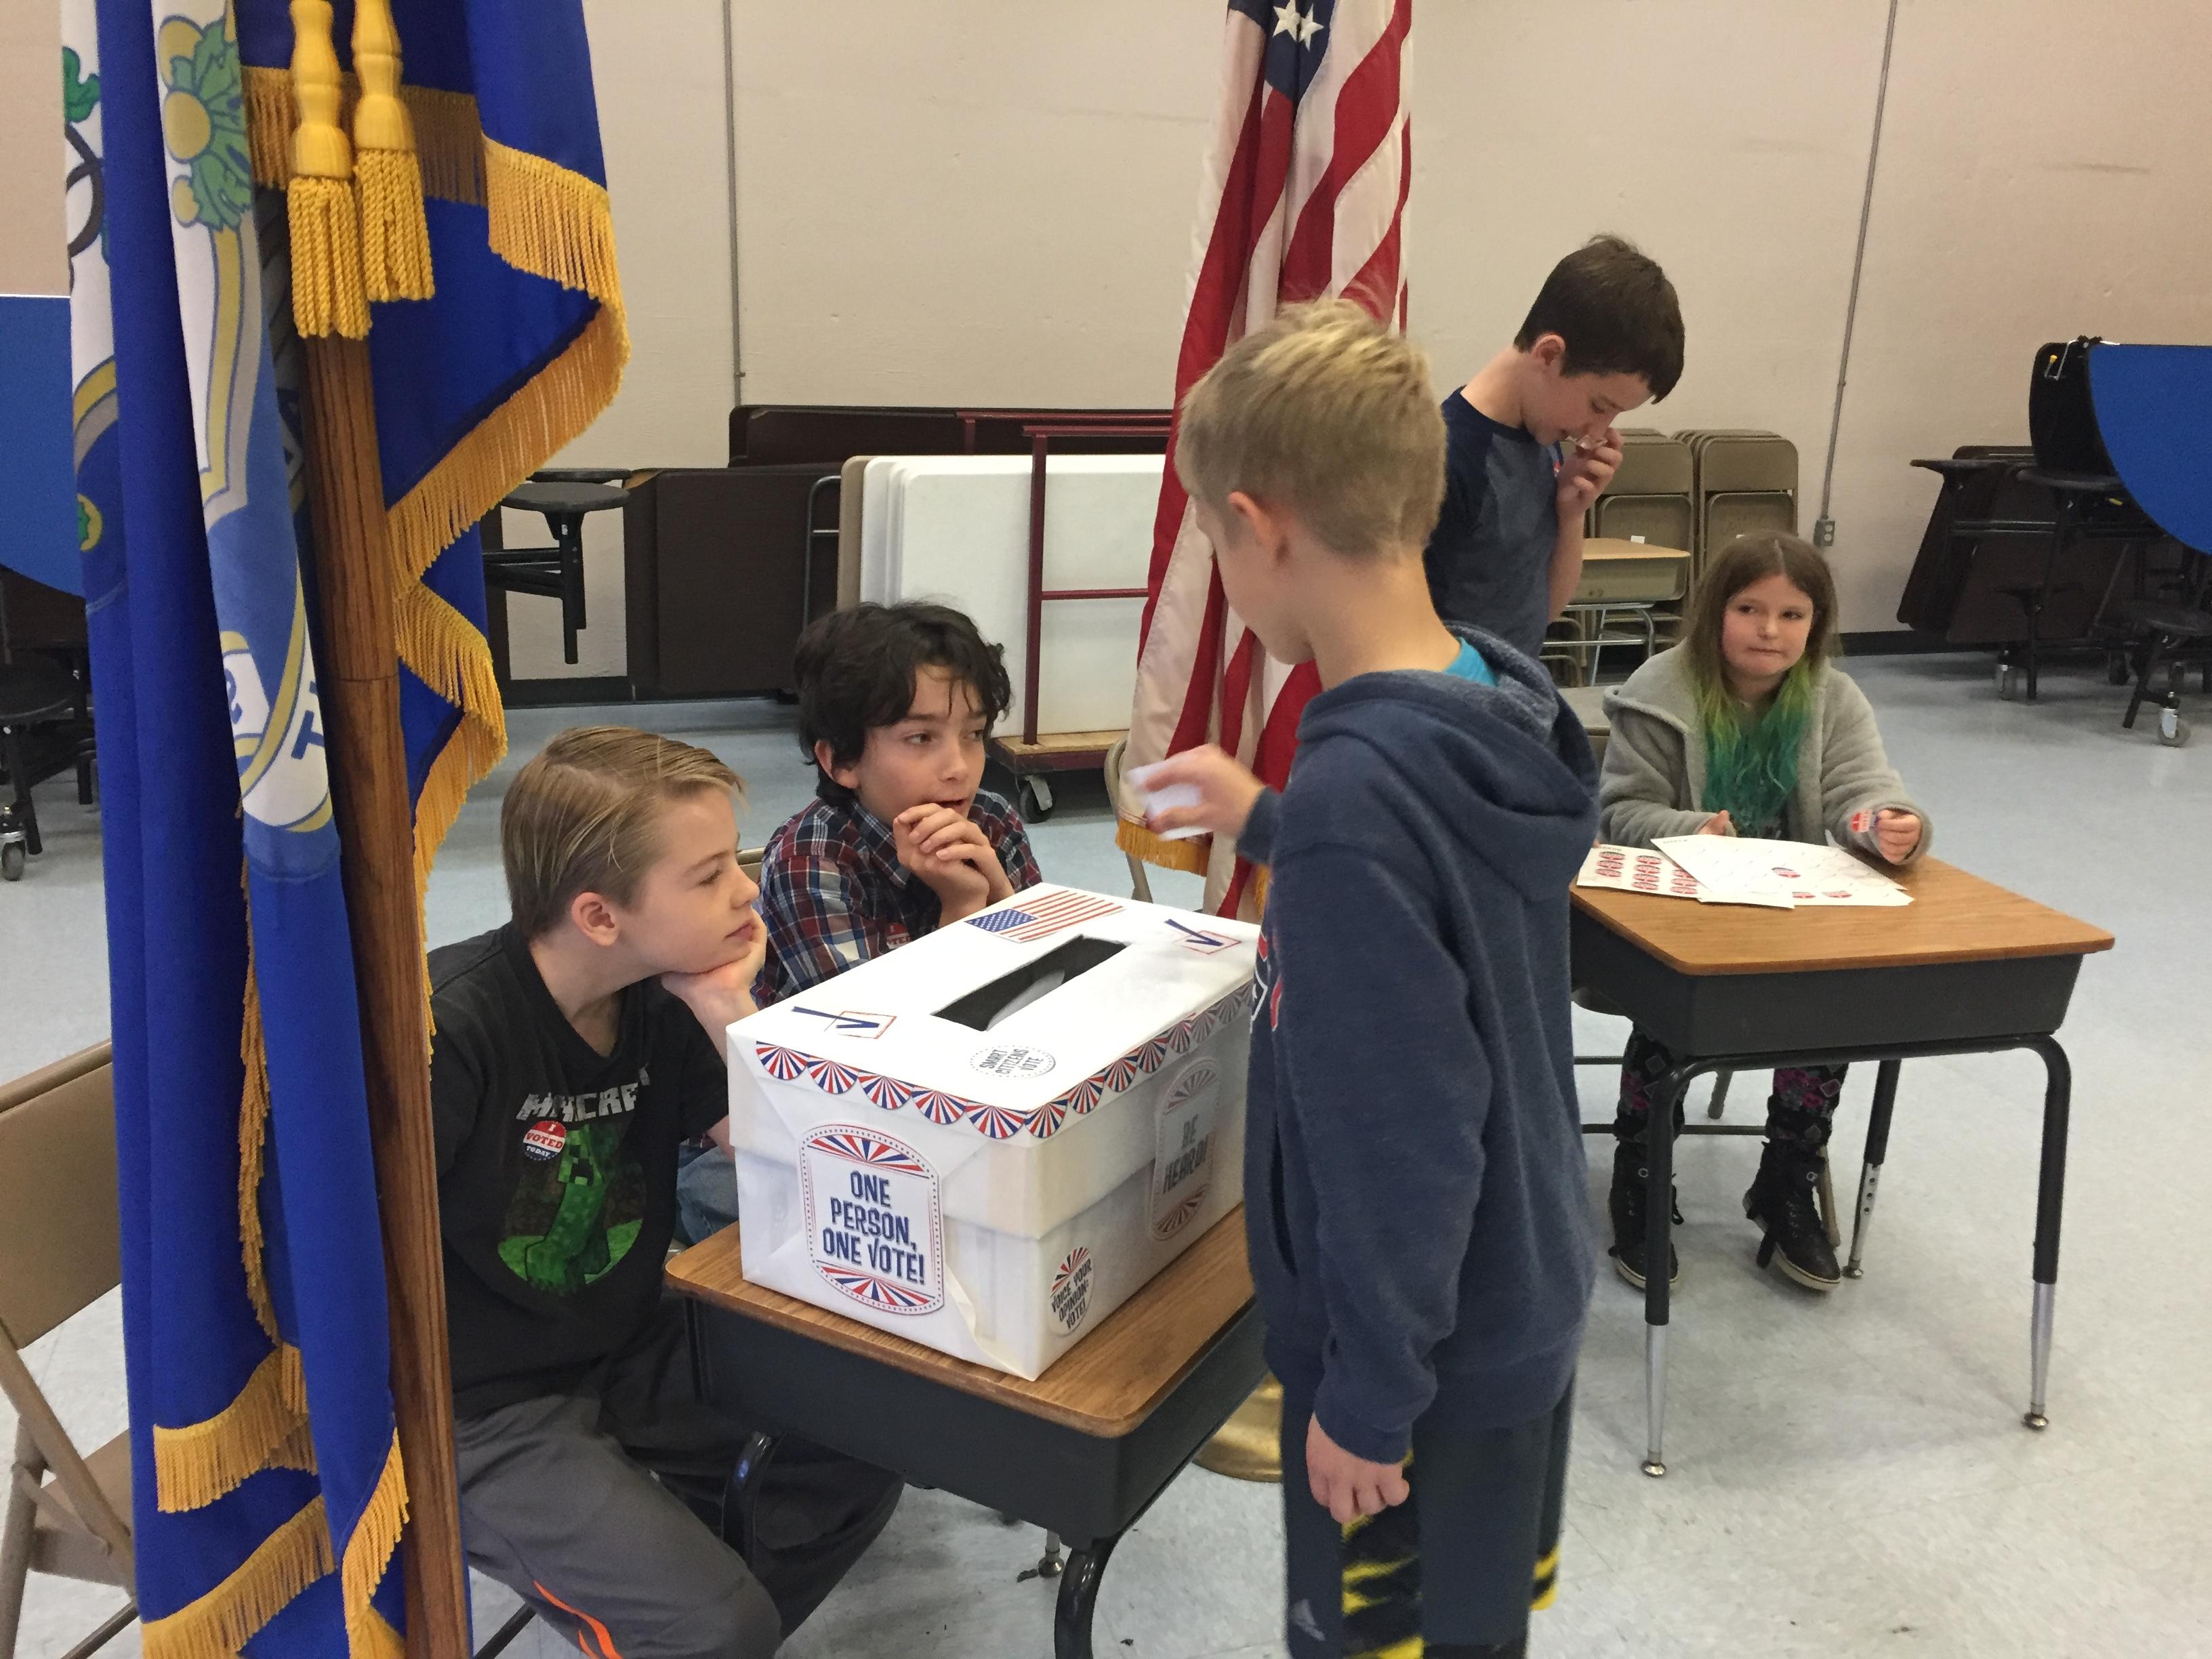 Hosting a school election